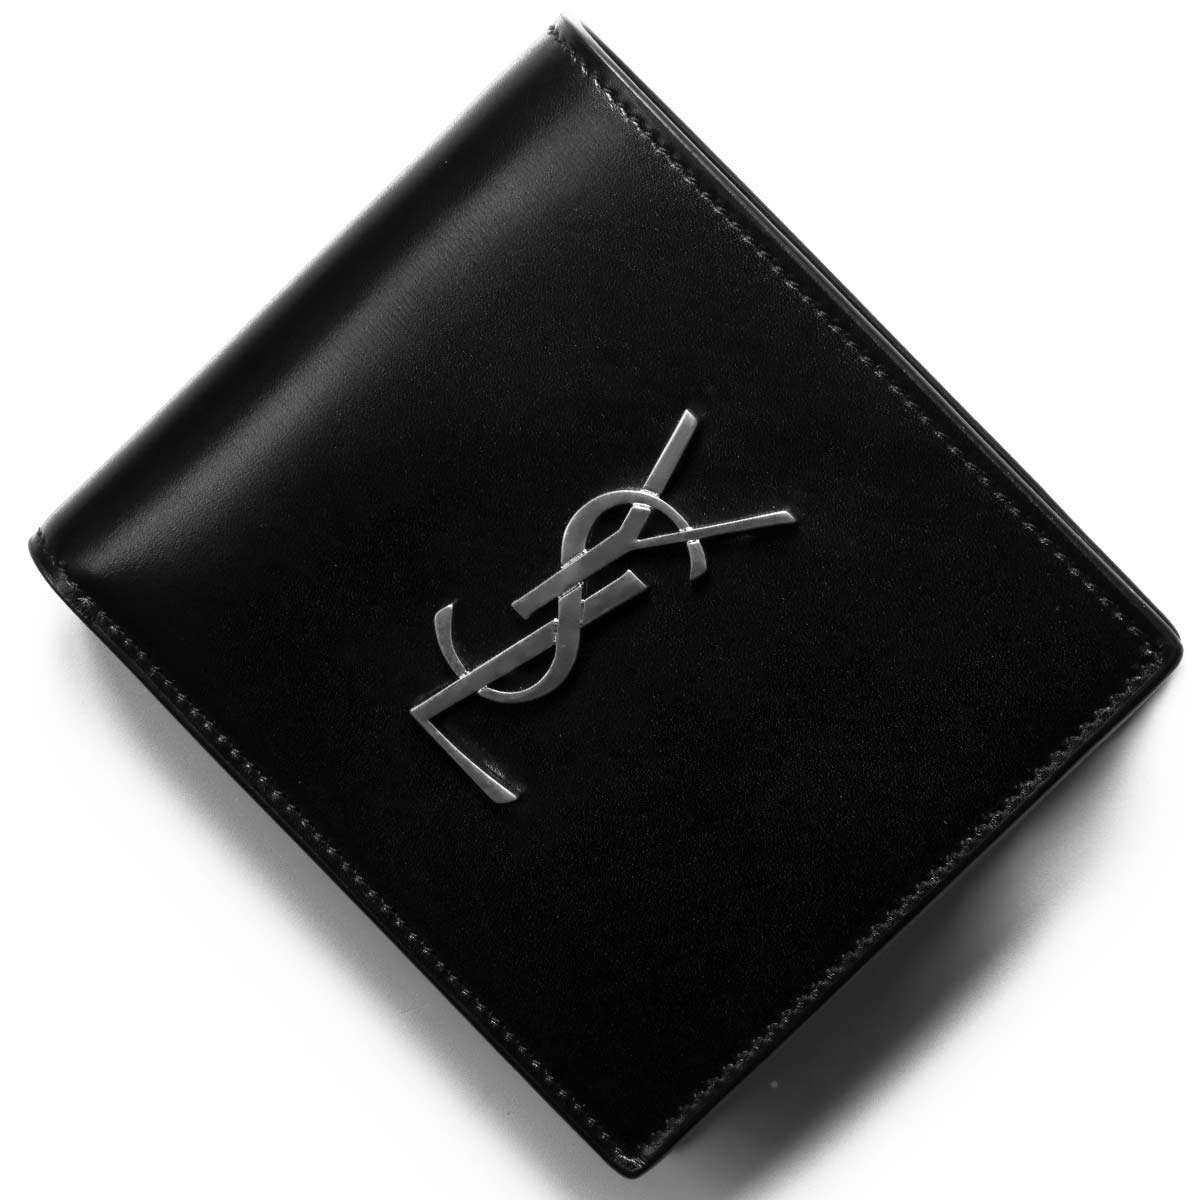 brand new 0f832 e45e3 サンローランパリ イヴサンローラン 二つ折財布【札入れ】 財布 ...